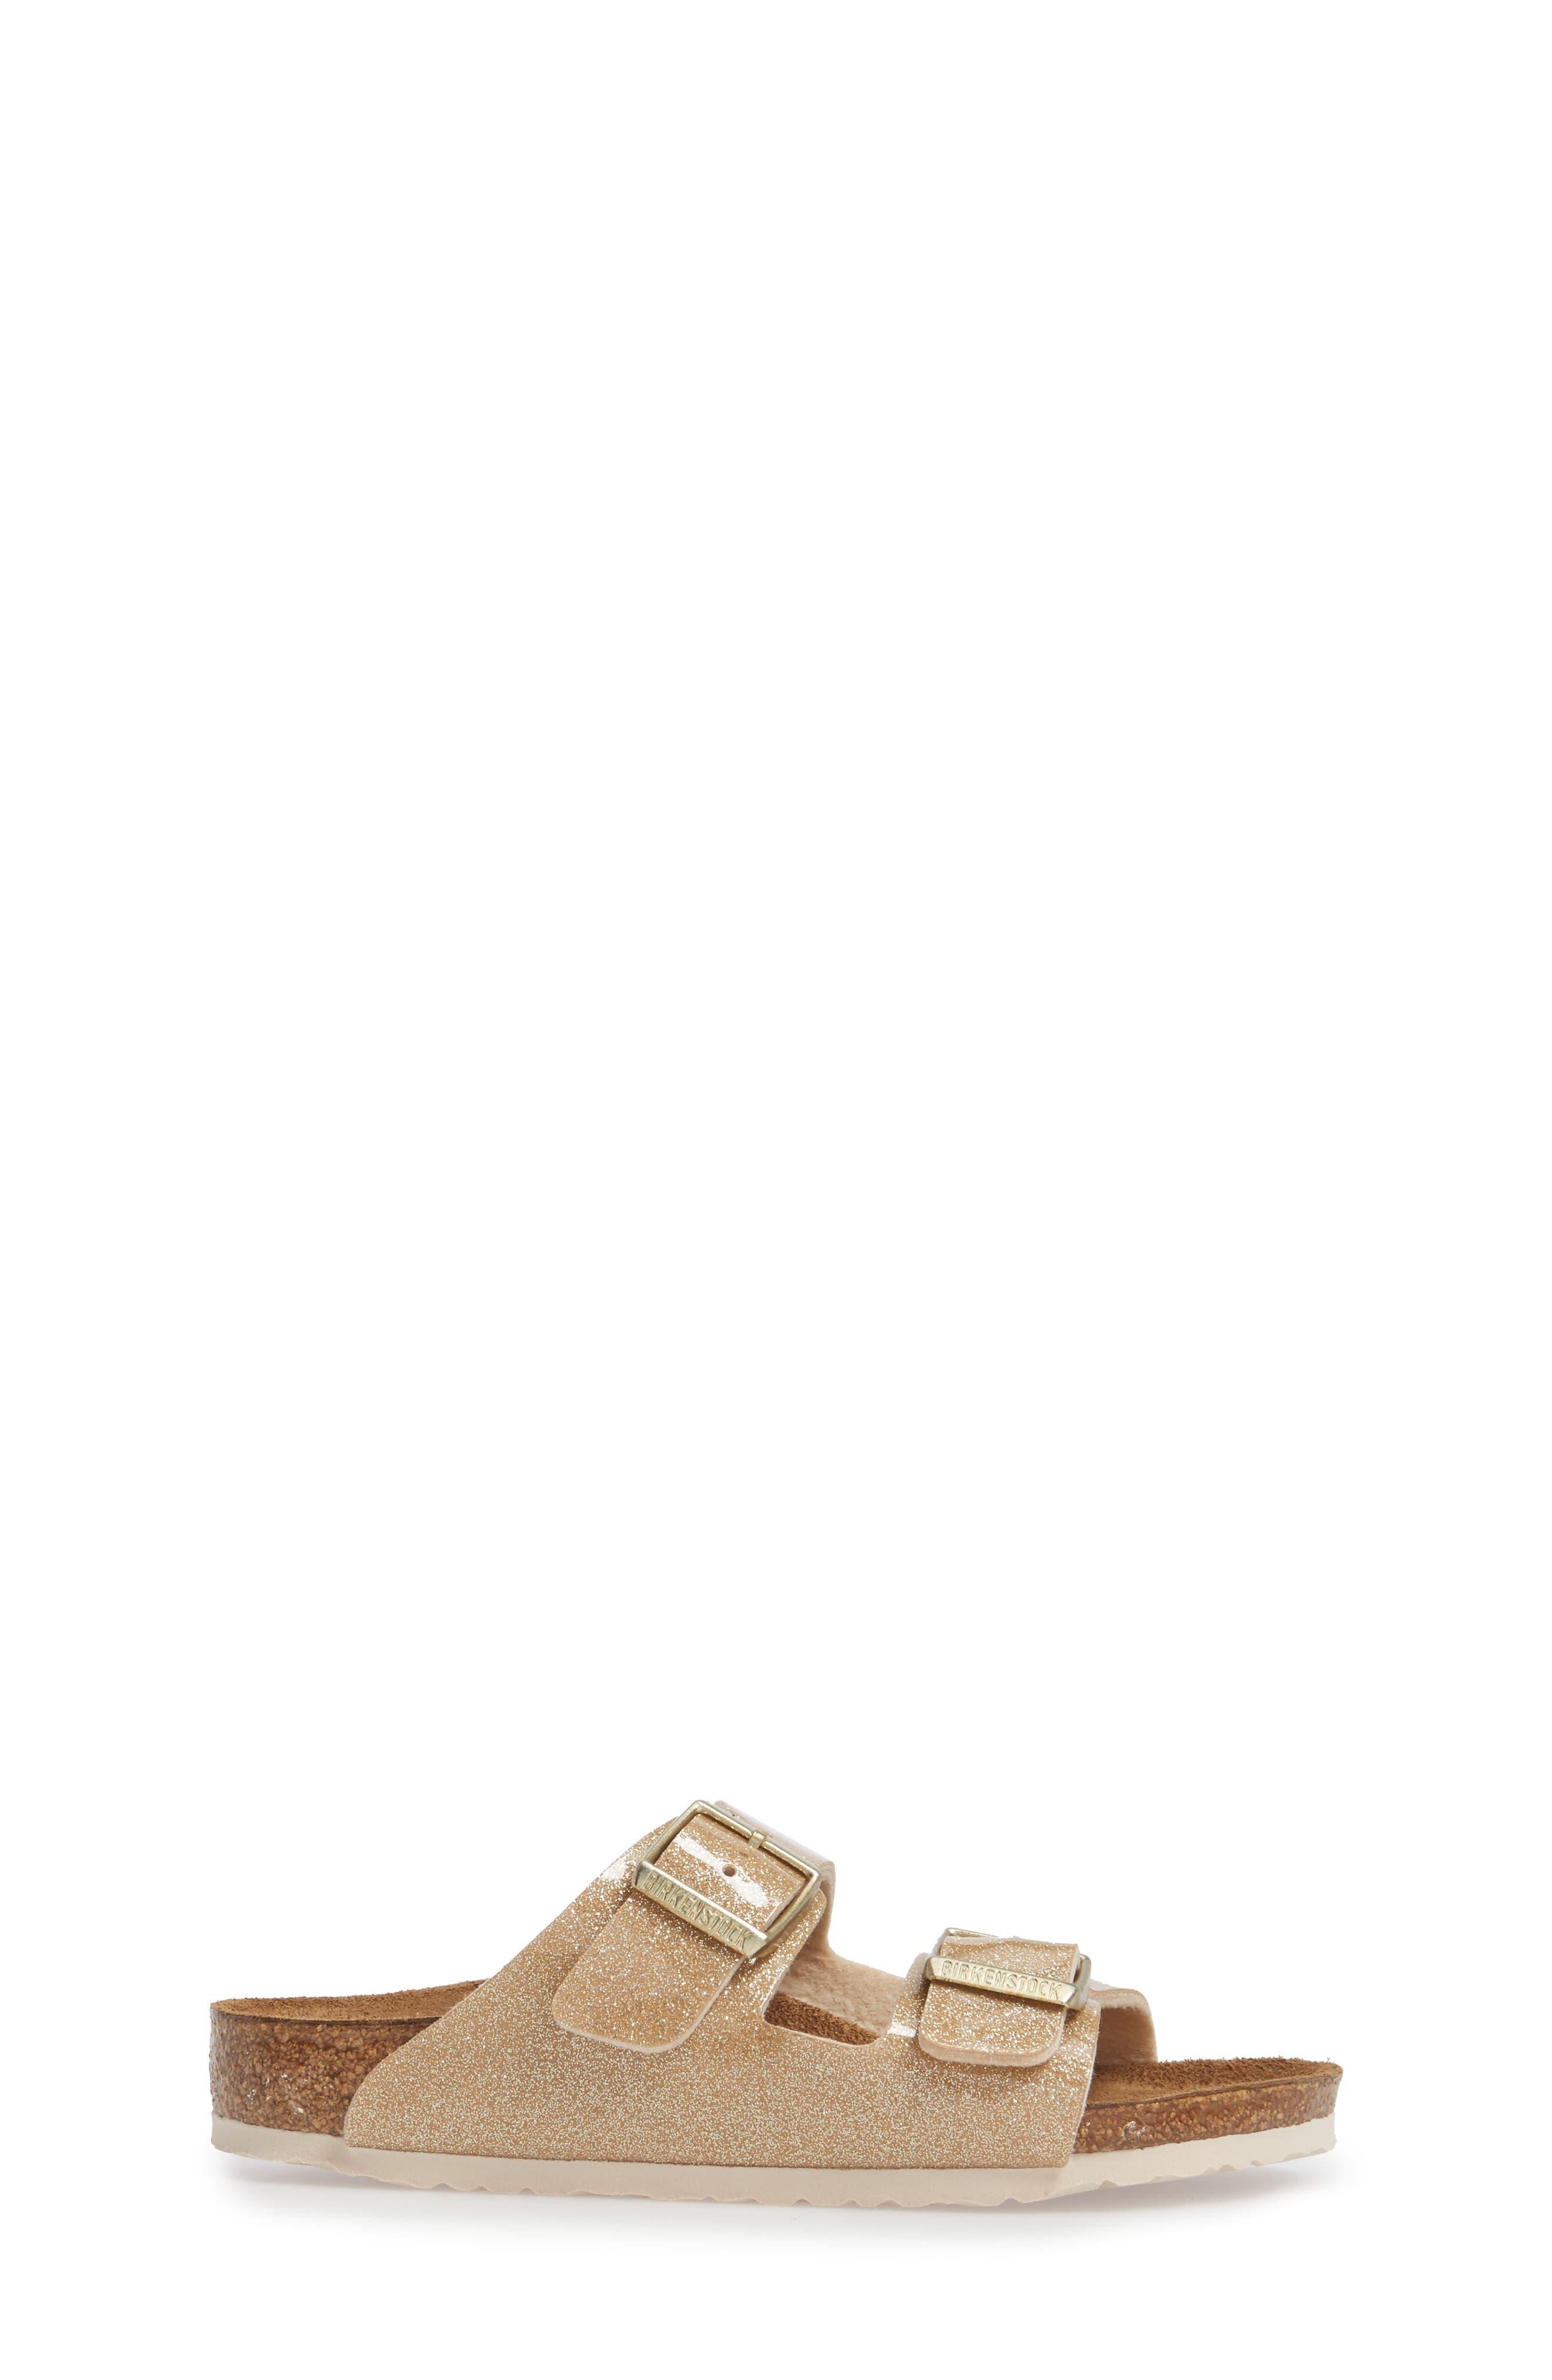 Alternate Image 3  - Birkenstock 'Arizona Galaxy Birko-Flor' Slide Sandal (Toddler & Little Kid)